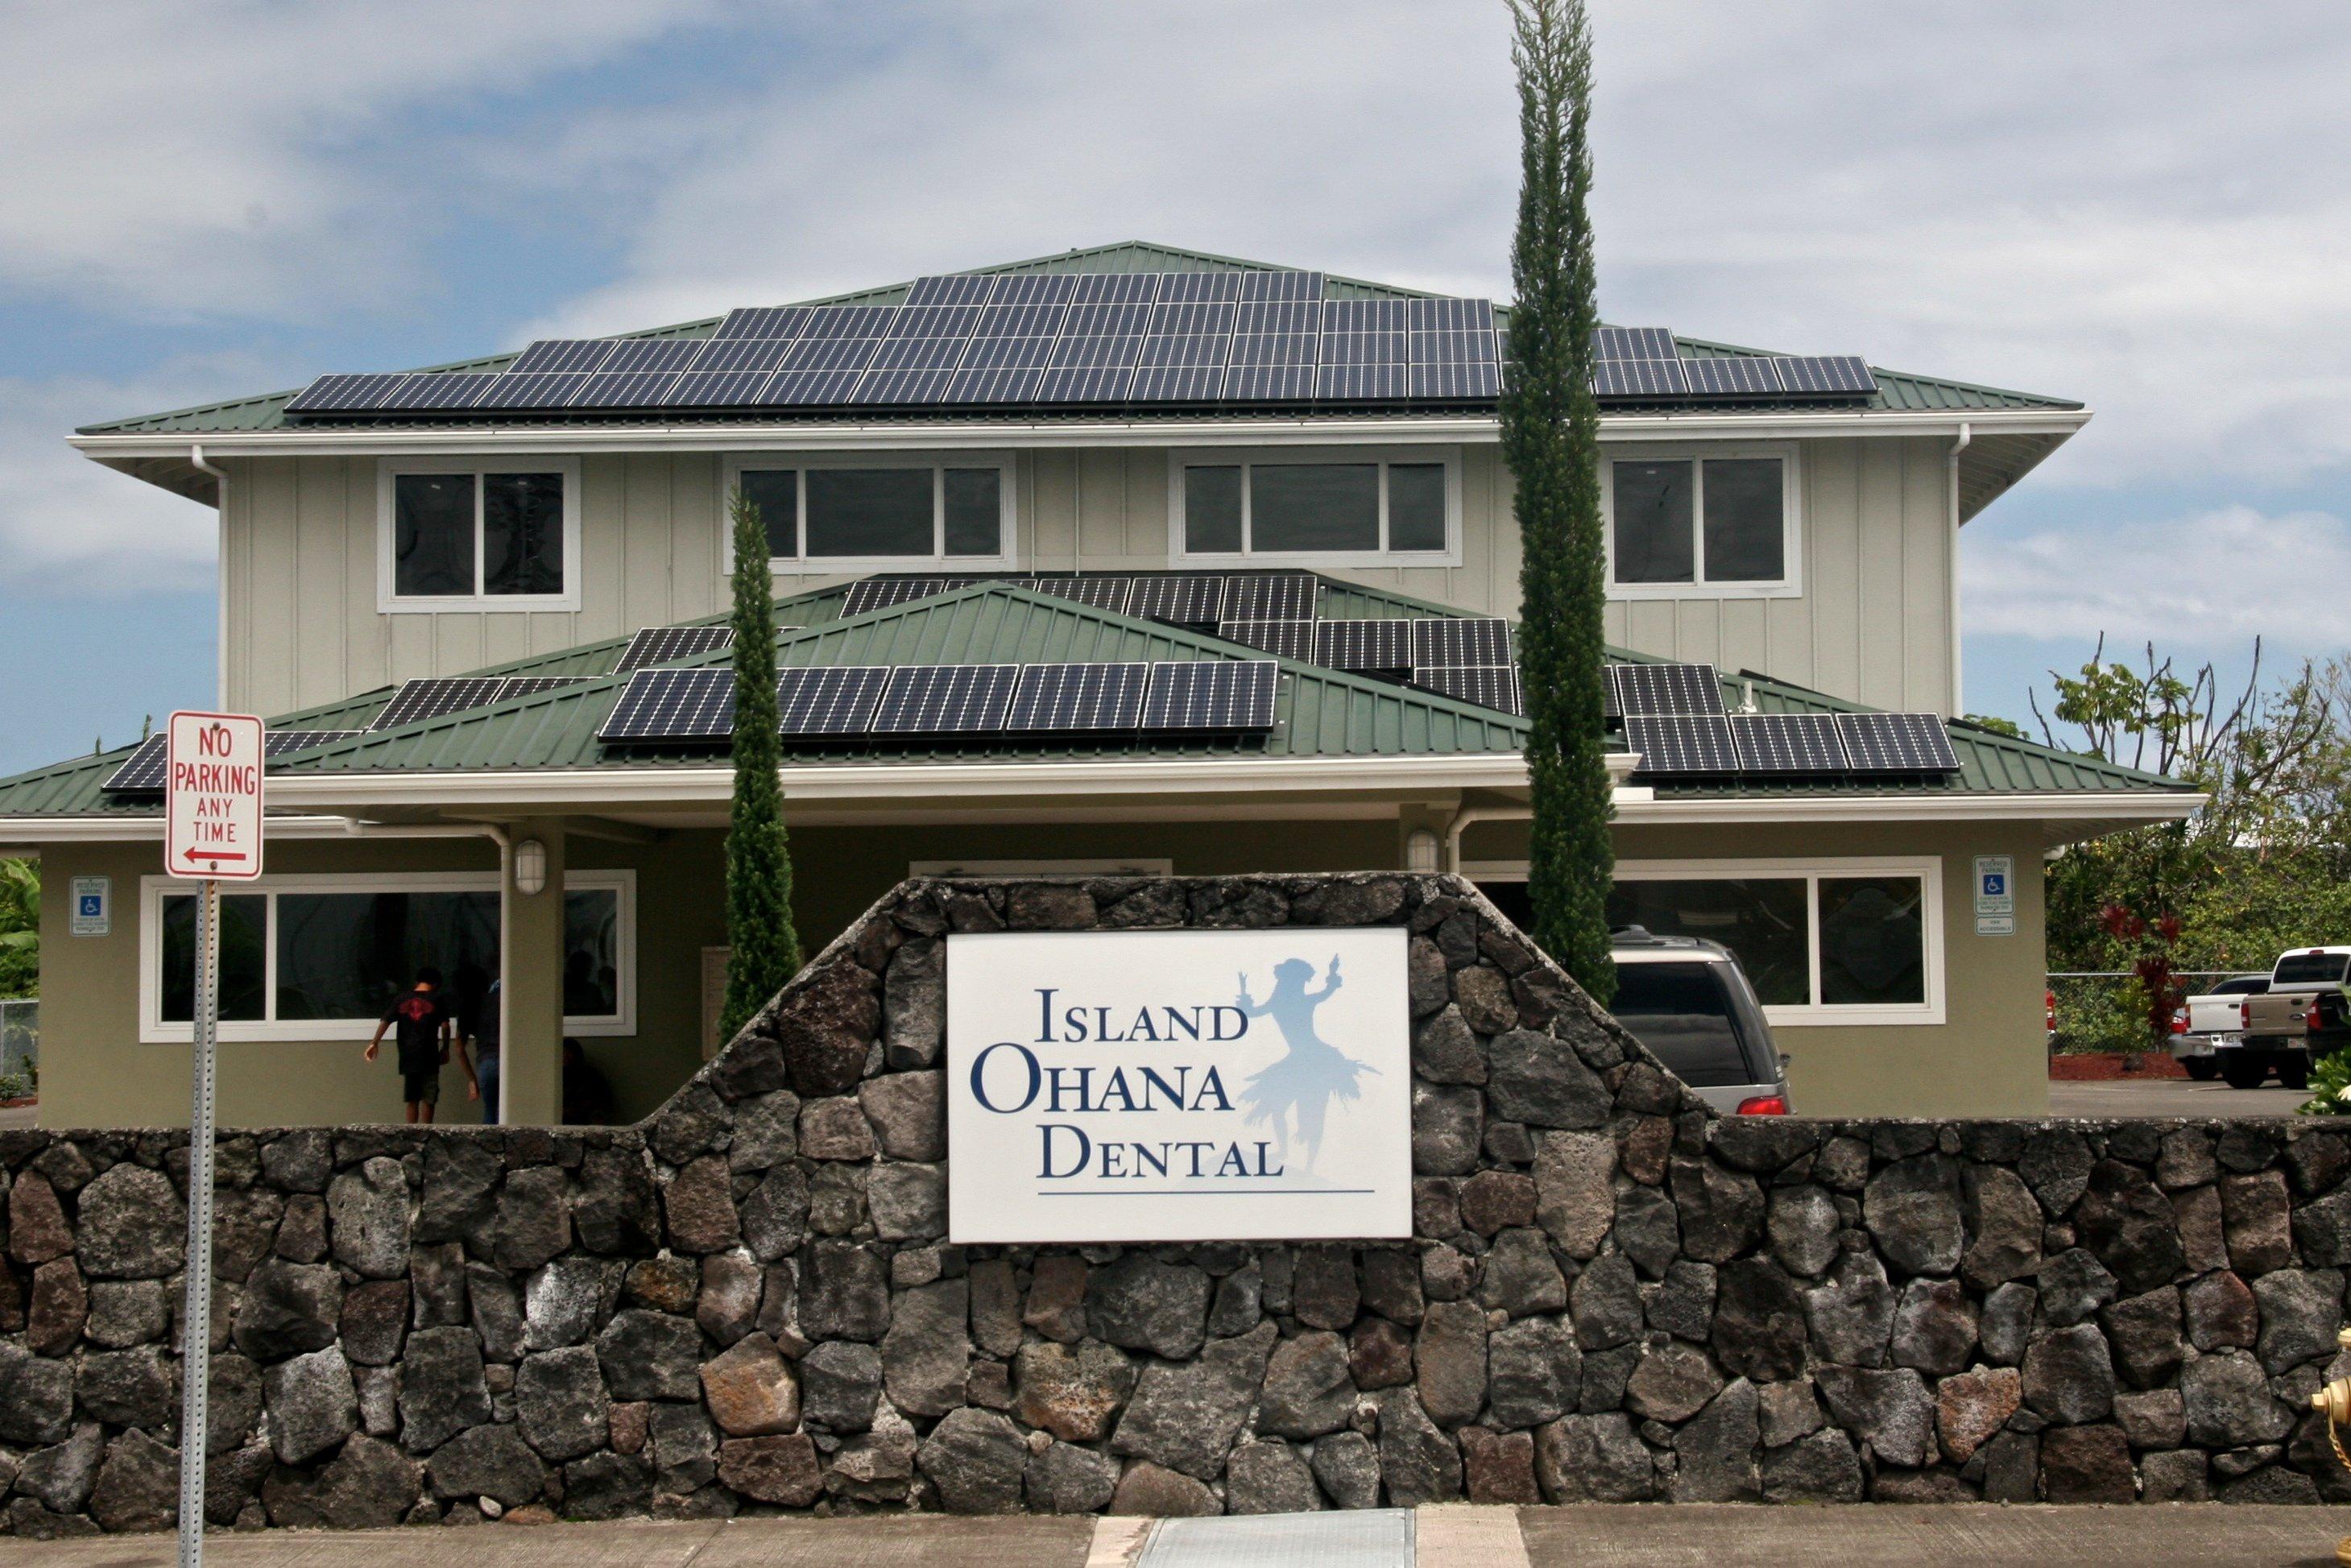 Island Ohana Dental installed 39.6 KW solar power system in Honokaa, HI